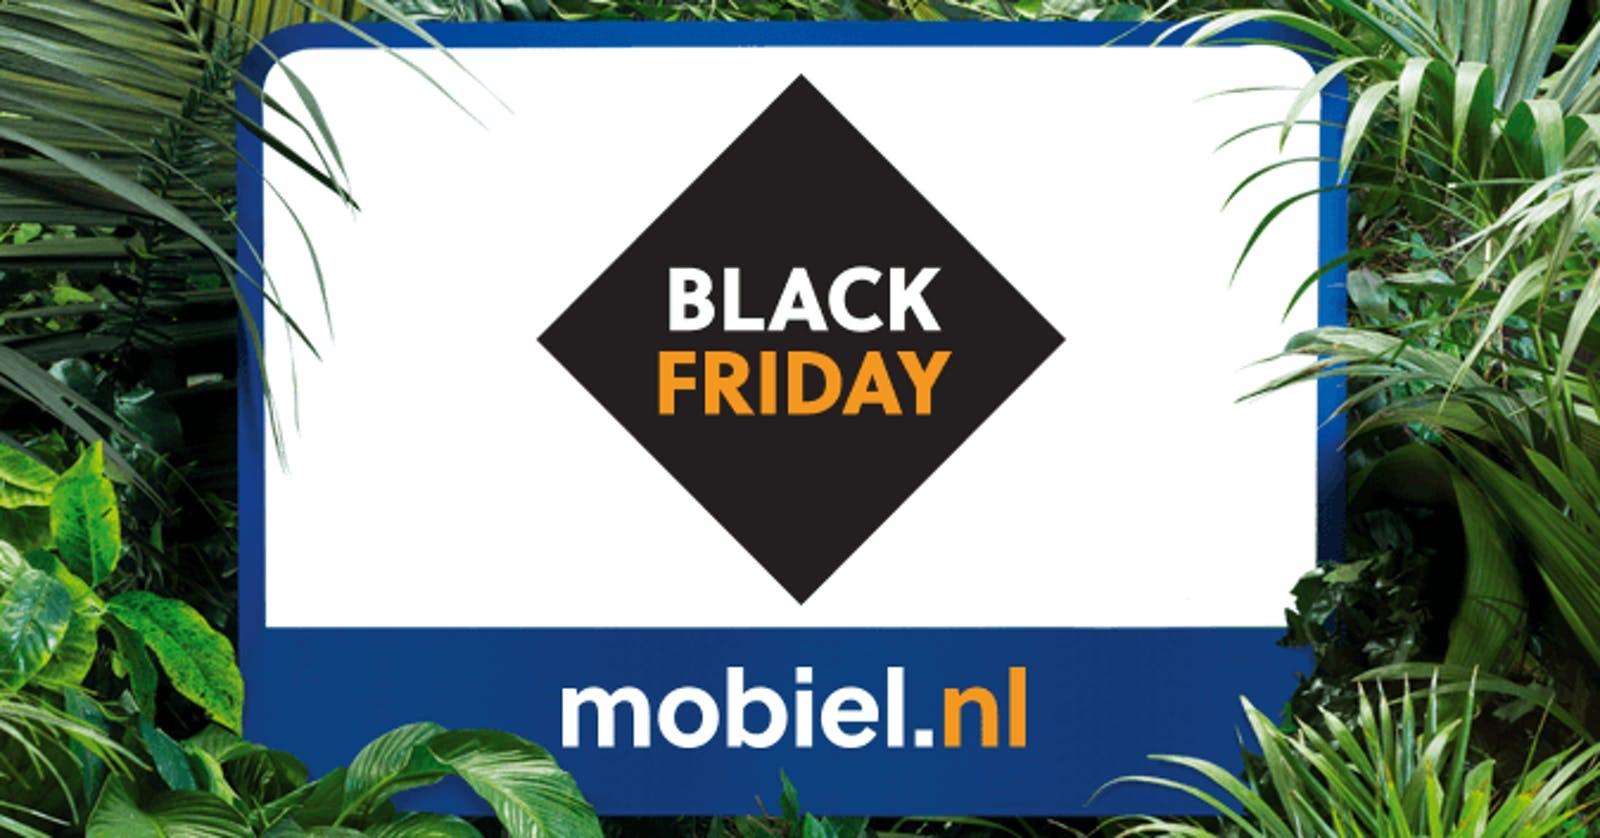 Mobiel.nl blackfriday met extra ING punten deal korting (€35)